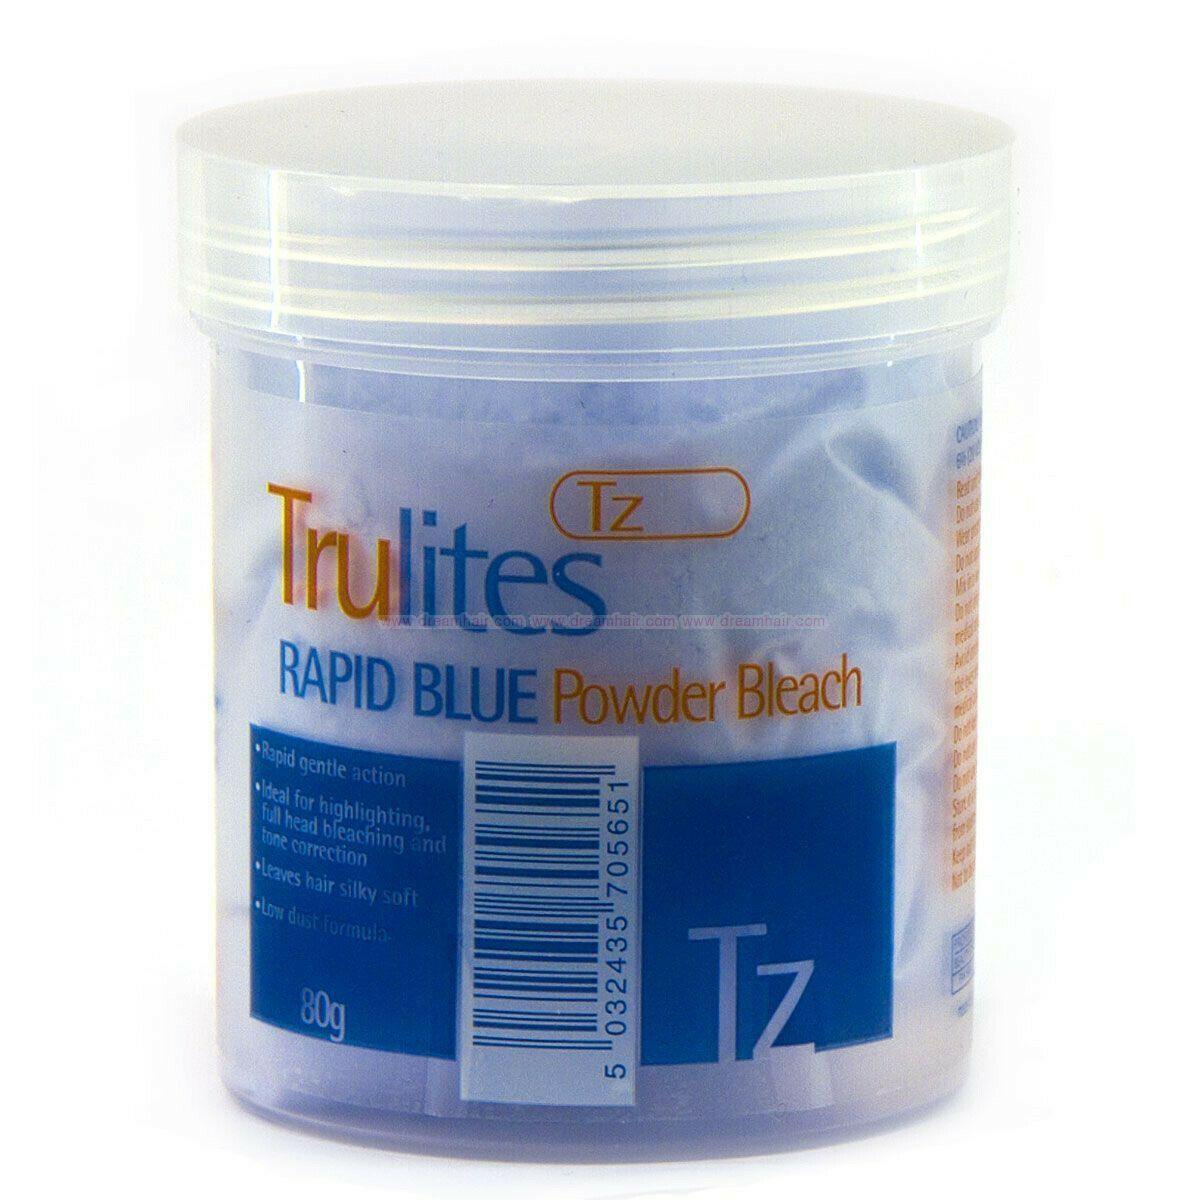 Truzone Trulites Rapid Blue Powder Bleach - 80g